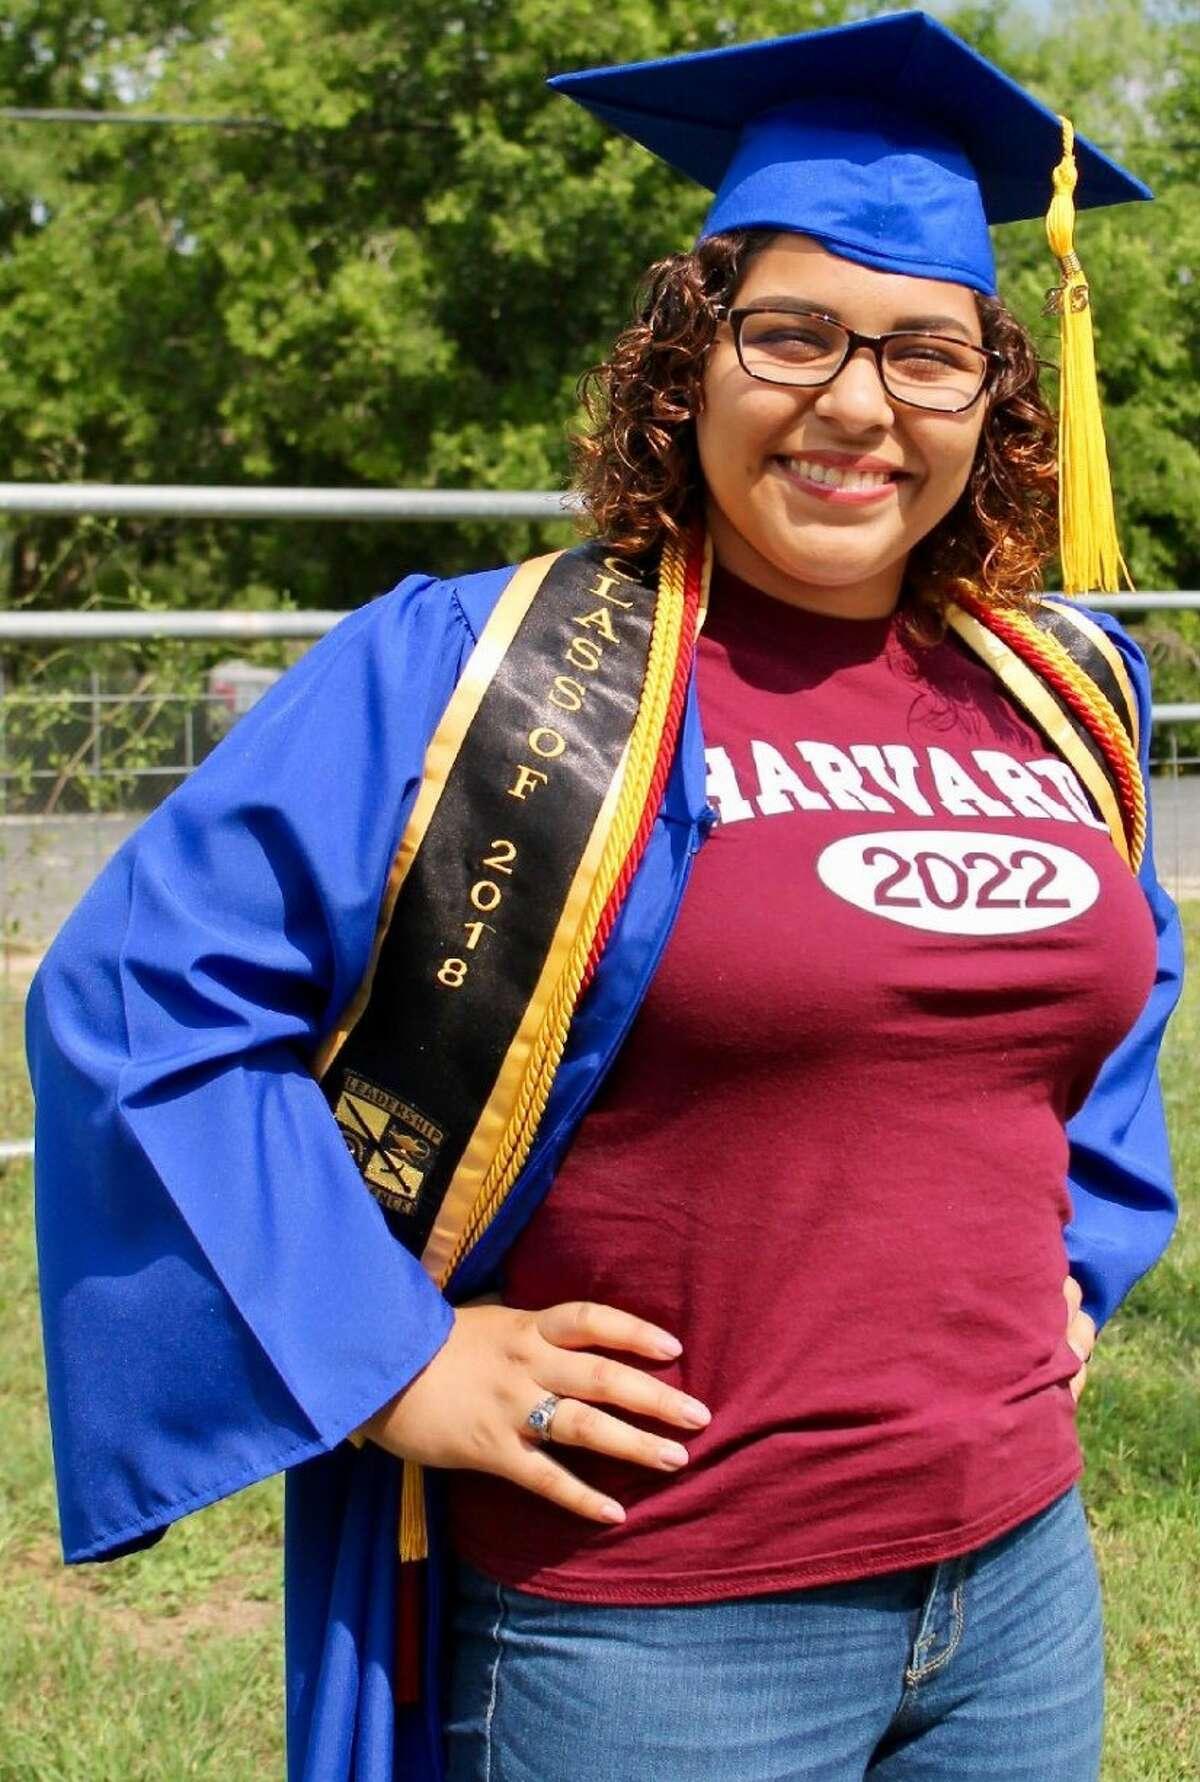 Somerset High School Valedictorian: Lucero Castañeda. Received full ride scholarships to Harvard, Dartmouth and Boston. She was also awarded The Gates Scholarship. She will be attending Harvard University.